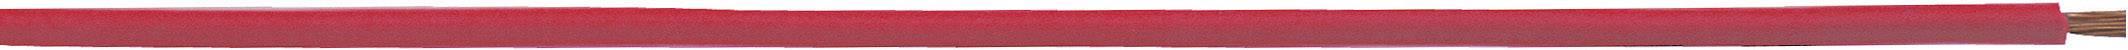 Opletenie / lanko LappKabel 4510051S H05V-K, 1 x 0.50 mm², vonkajší Ø 2.50 mm, 250 m, biela